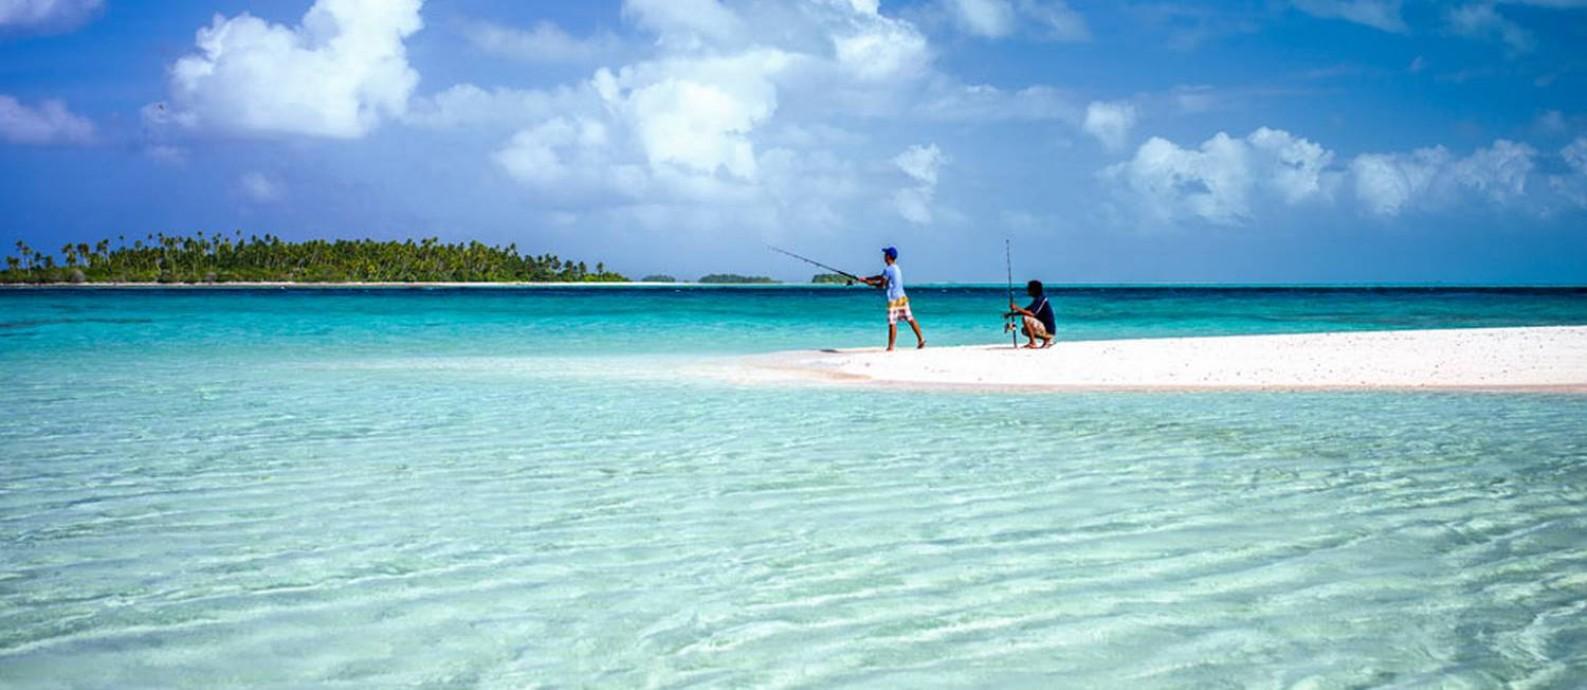 Jovens pescam no atol de Abaiang, nas Ilhas Gilbert, em Kiribati Foto: David Kirkland / Kiribati National Tourism Office / Divulgação